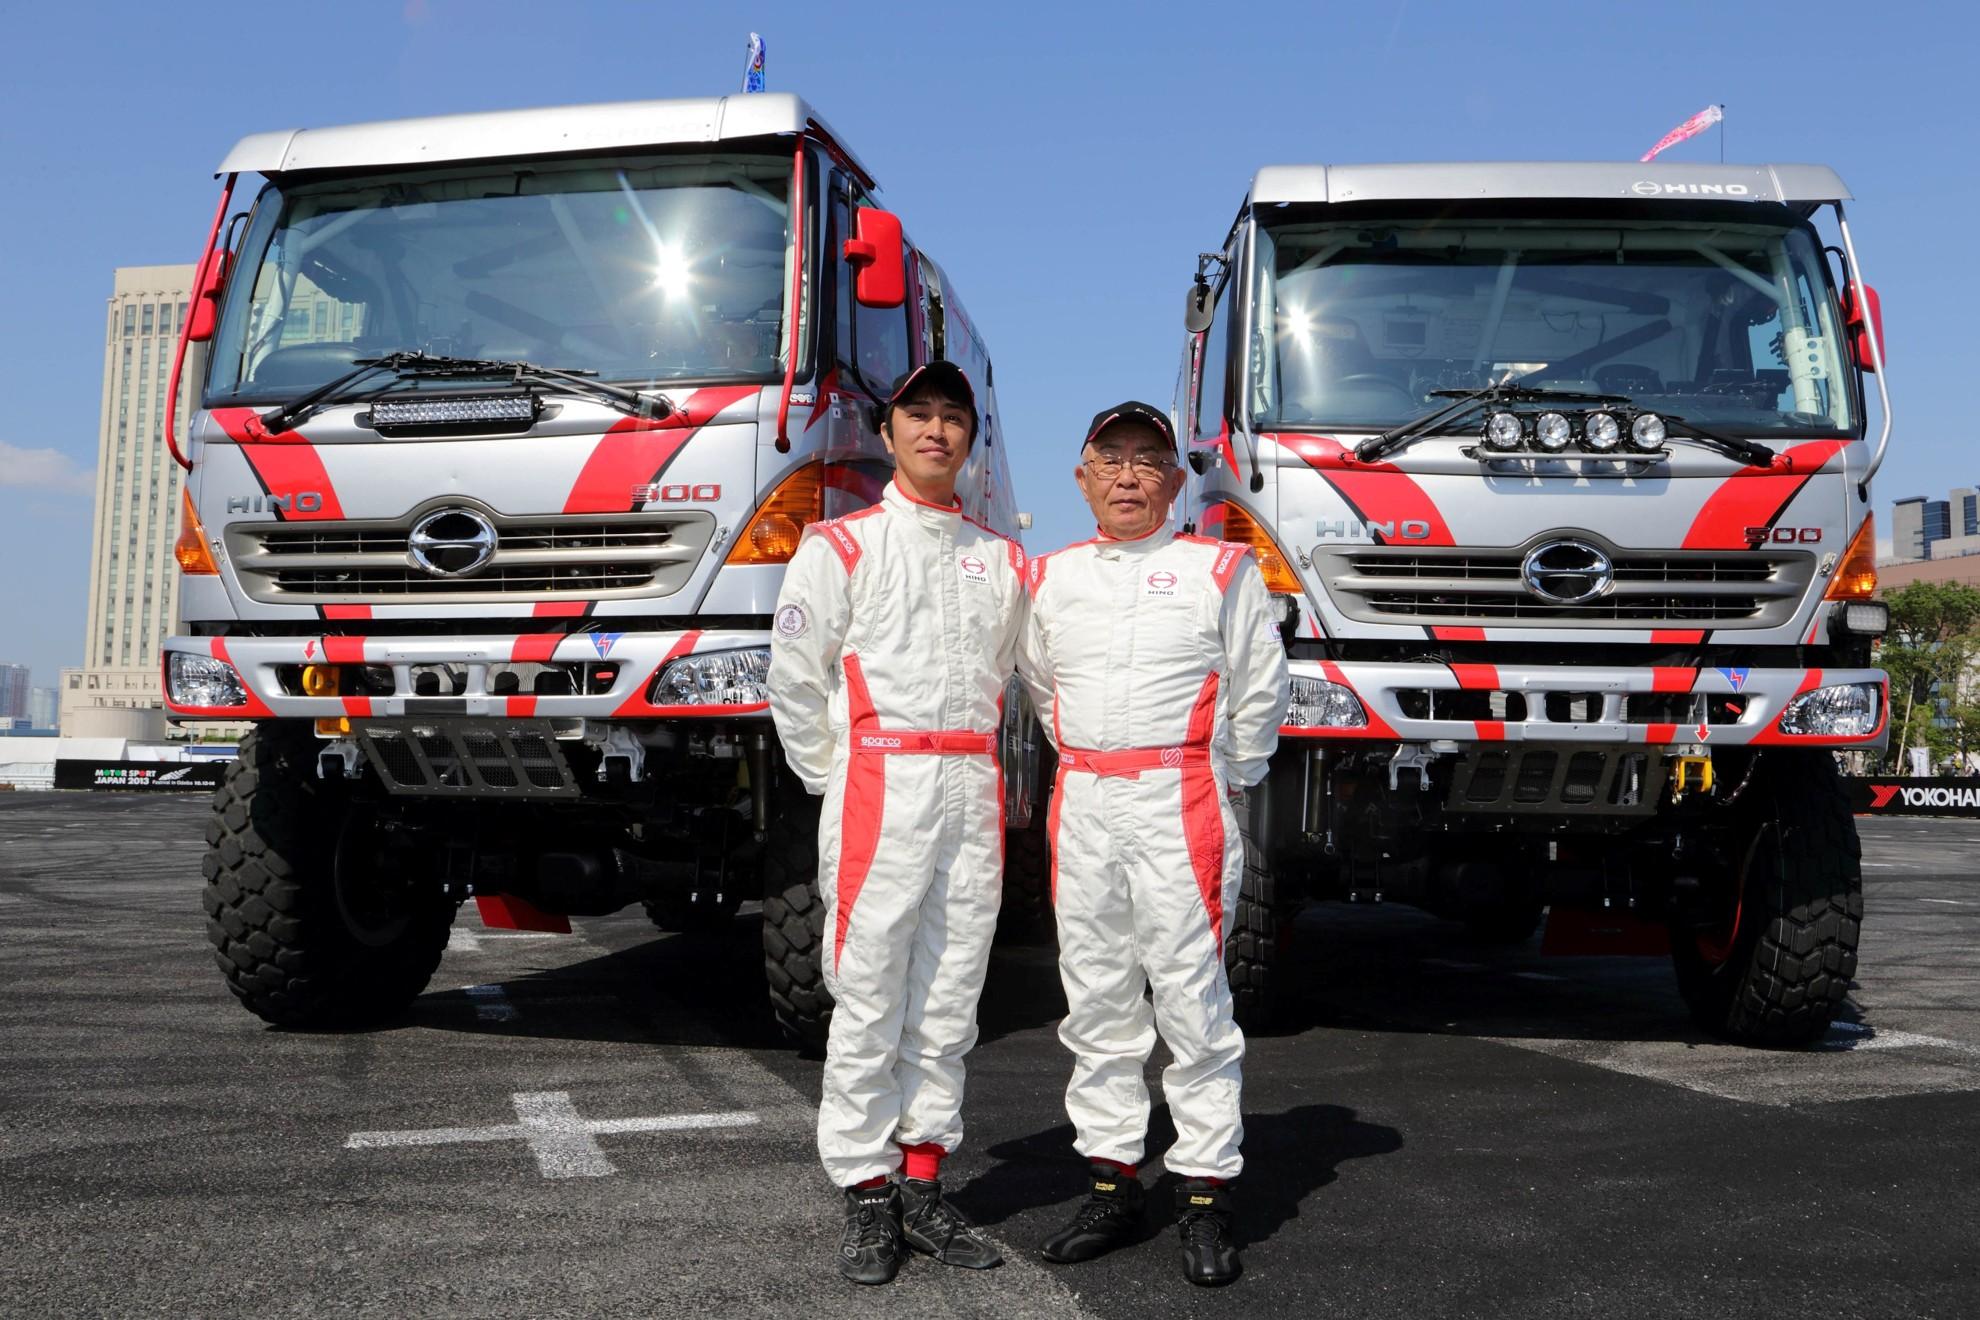 Dakar Rally1